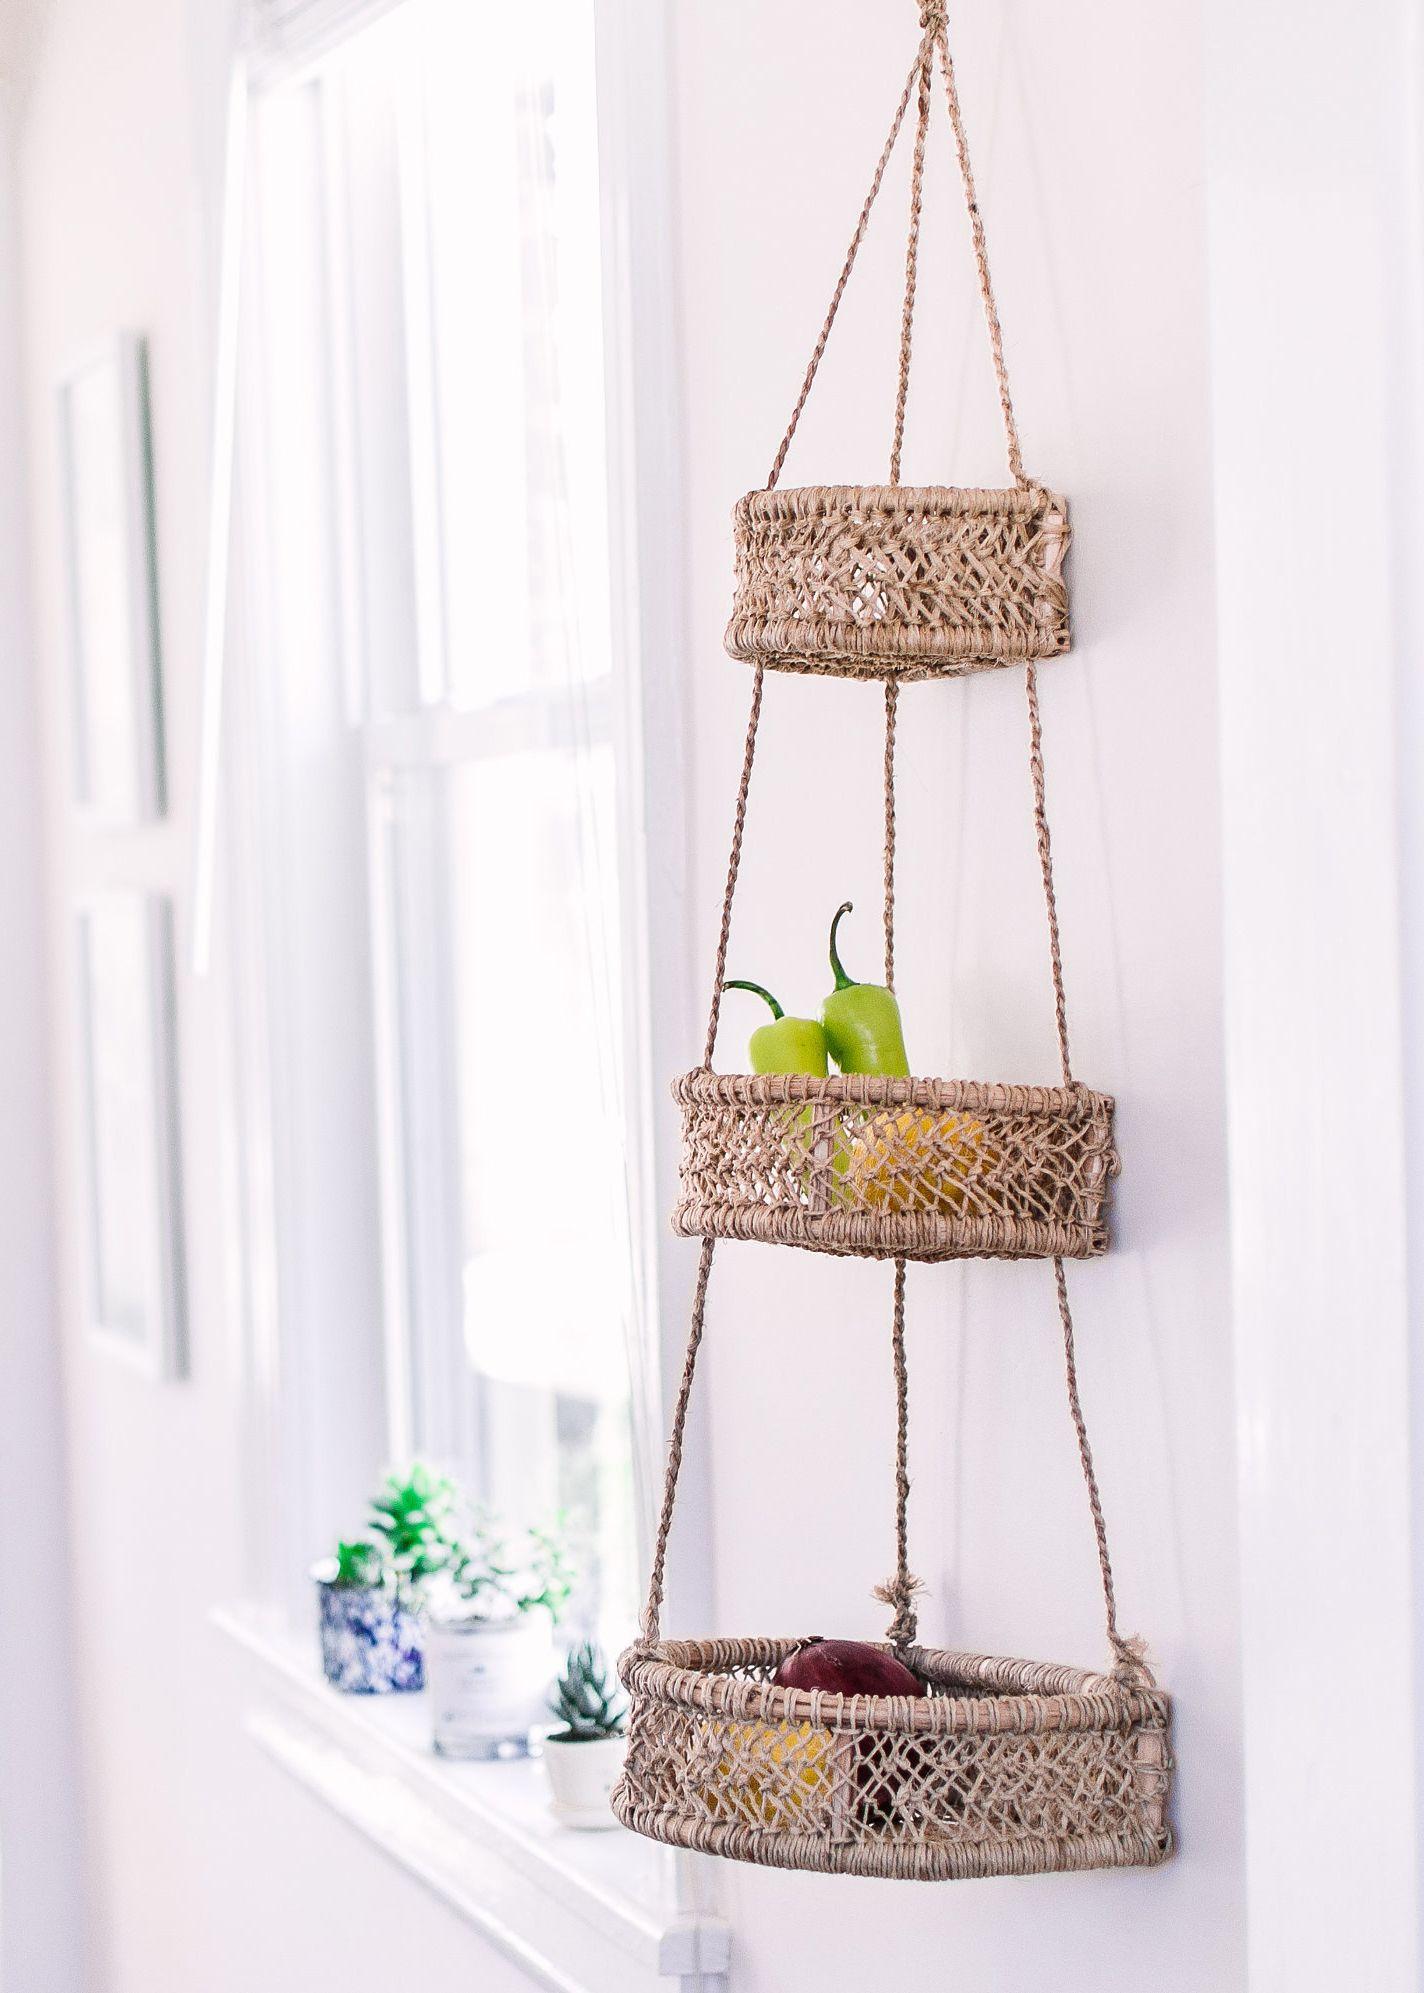 Etsy Half Moon Woven Hanging Fruit Basket Hanging Fruit Baskets